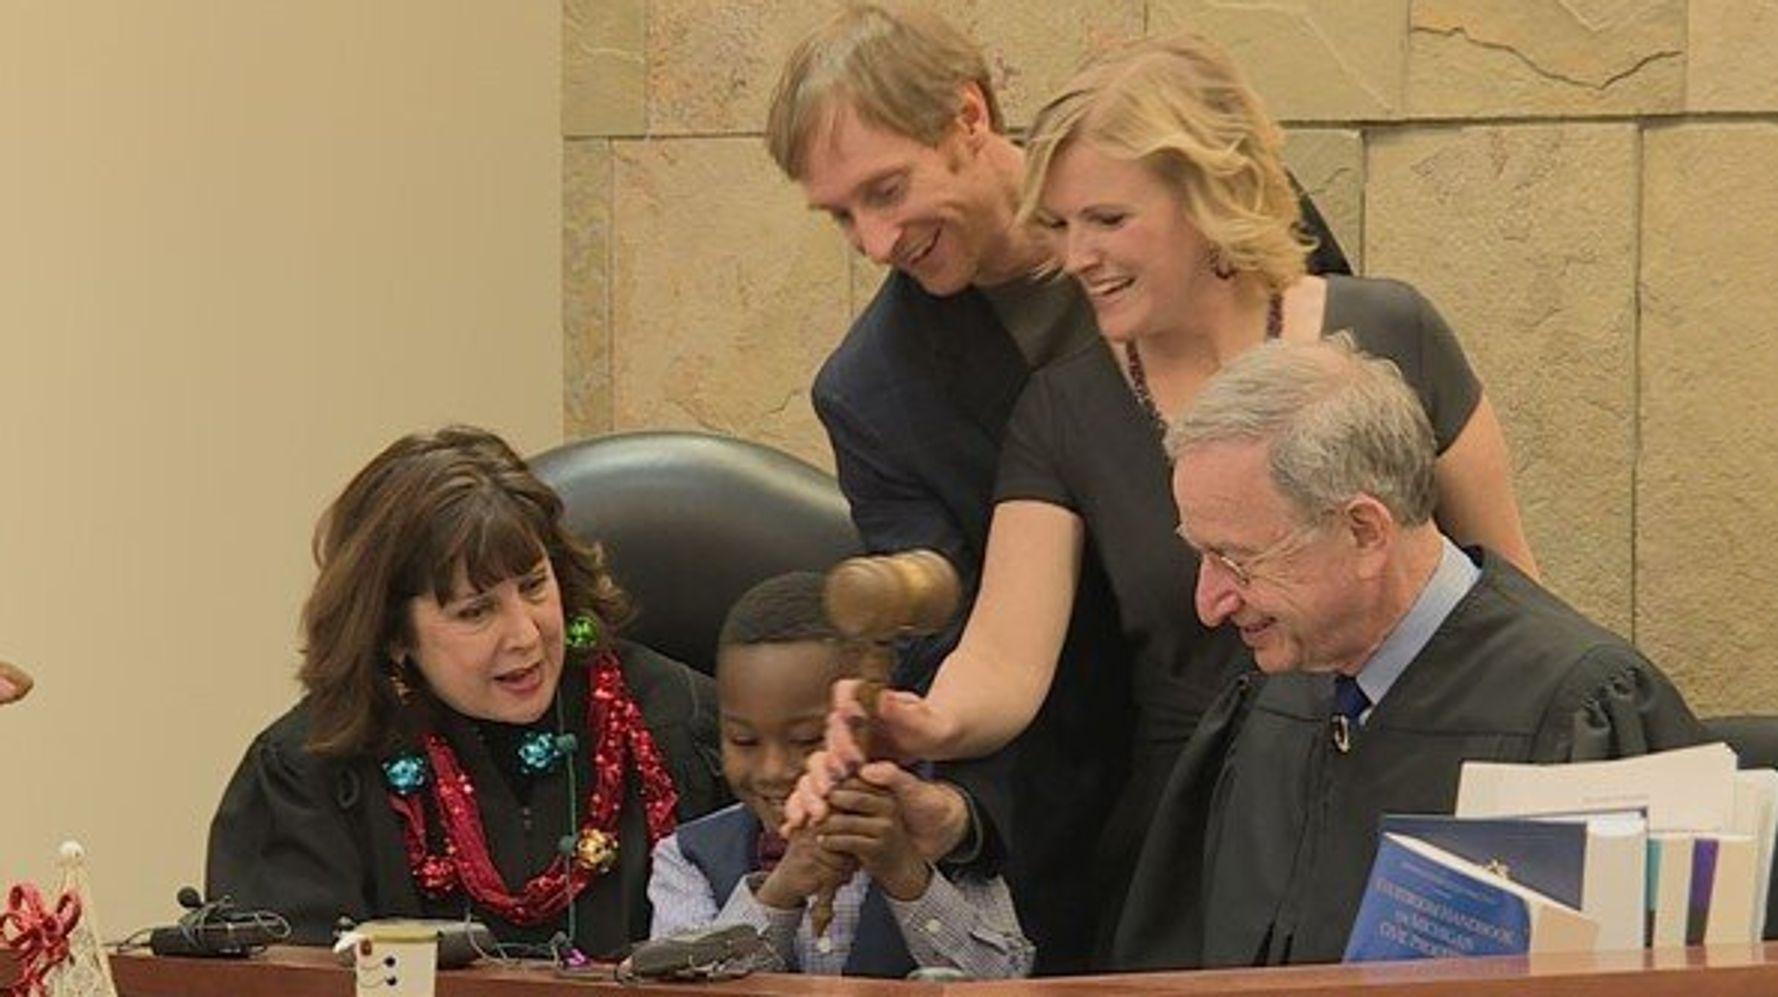 Westlake Legal Group 5de9da4e1f0000143cdf09cc Kindergarten Class Represents At Pal's Final Adoption Hearing